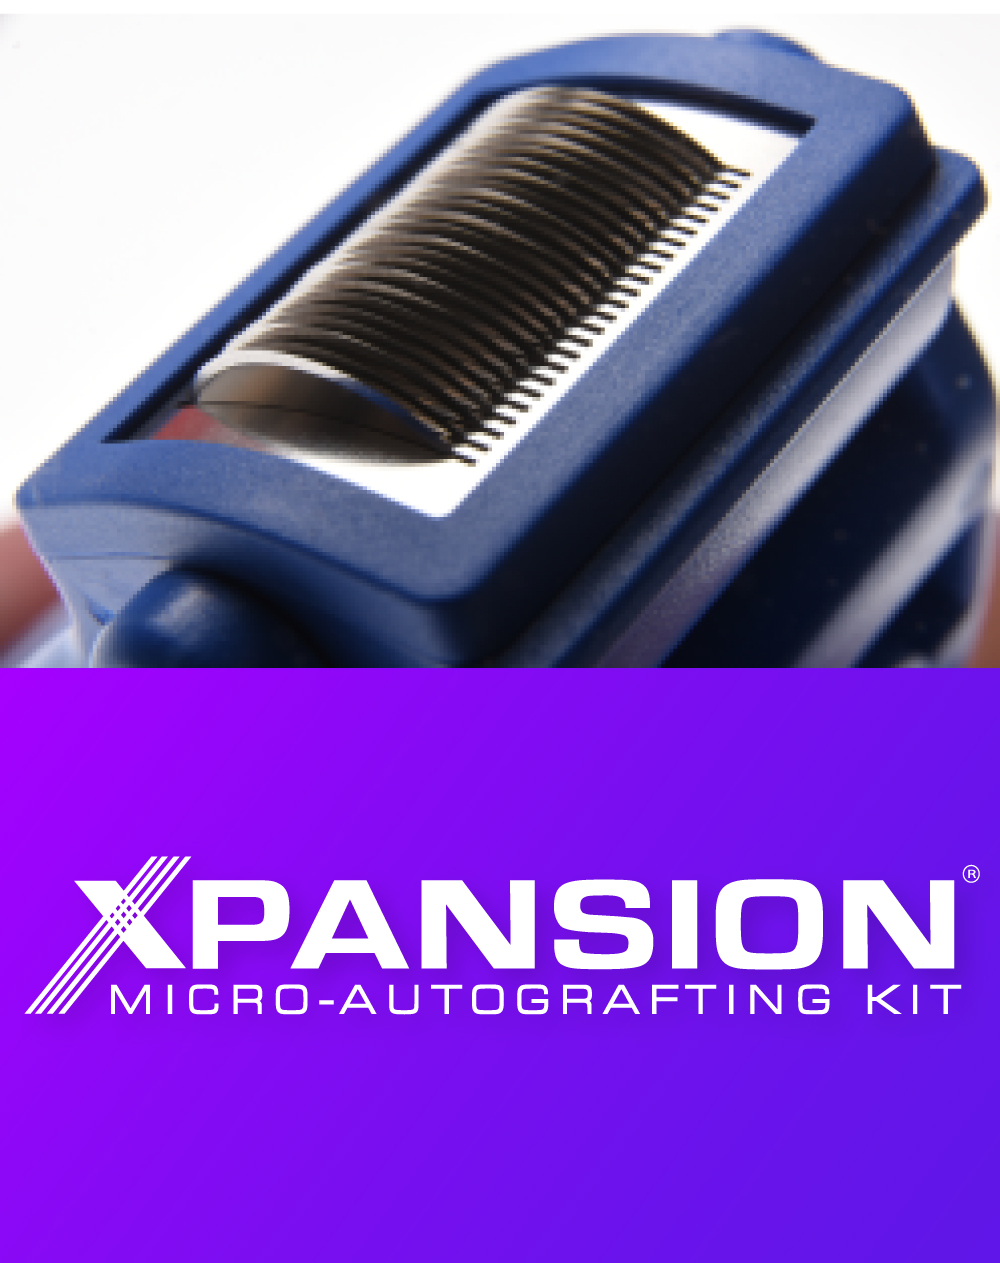 Xpansion Micro-Autografting Kit